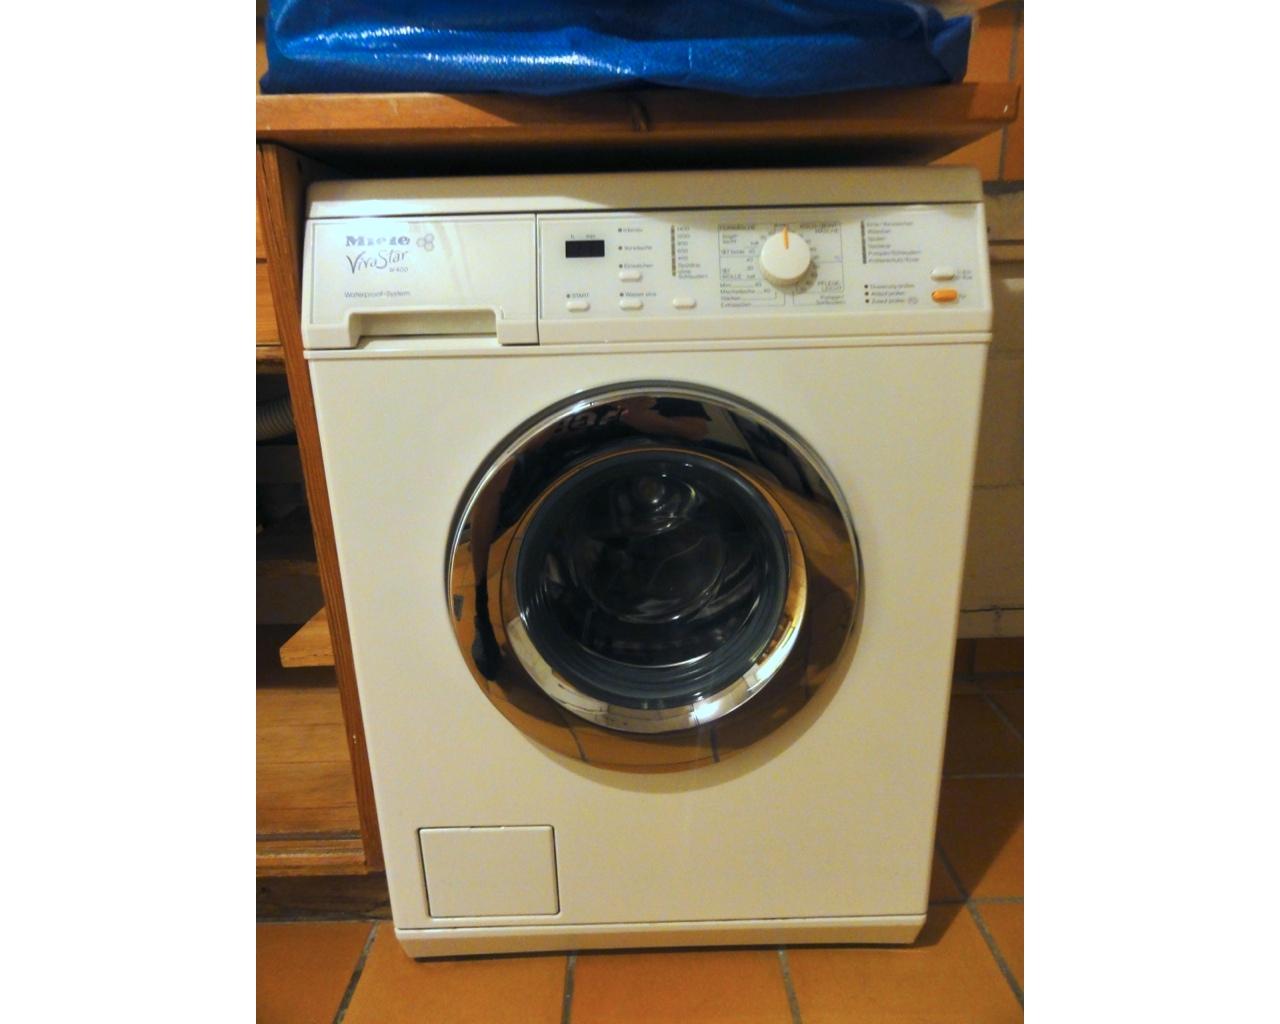 waschmaschine miele vivastar w400 ebay. Black Bedroom Furniture Sets. Home Design Ideas